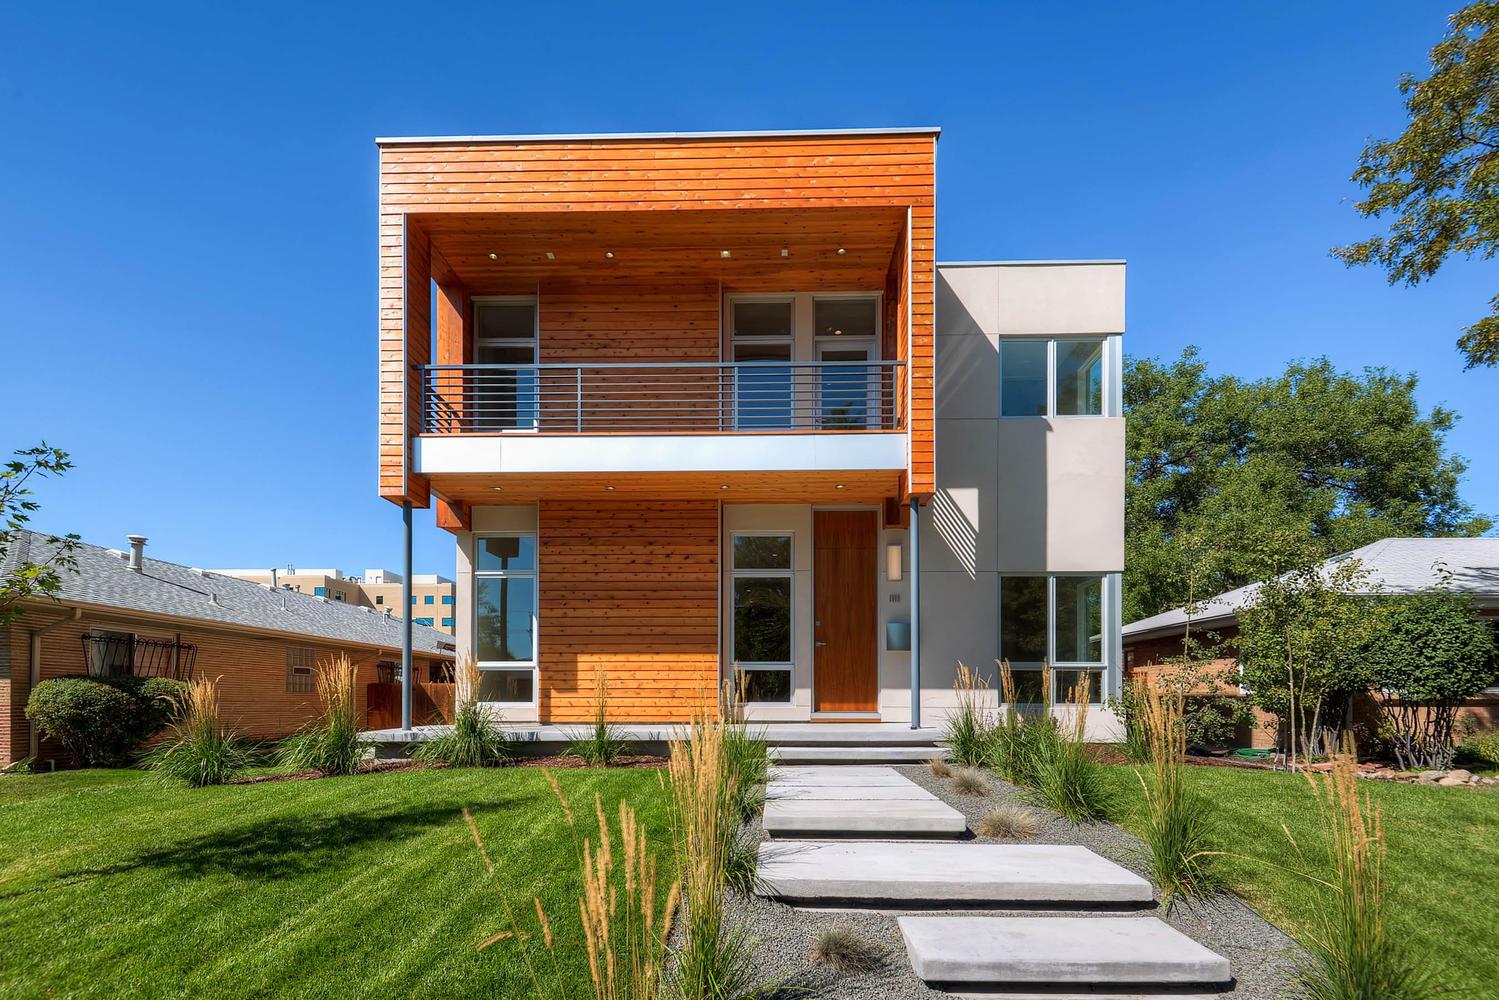 Best Kitchen Gallery: Modern Homes In Denver Home Decor Ideas of Modern Denver Homes  on rachelxblog.com